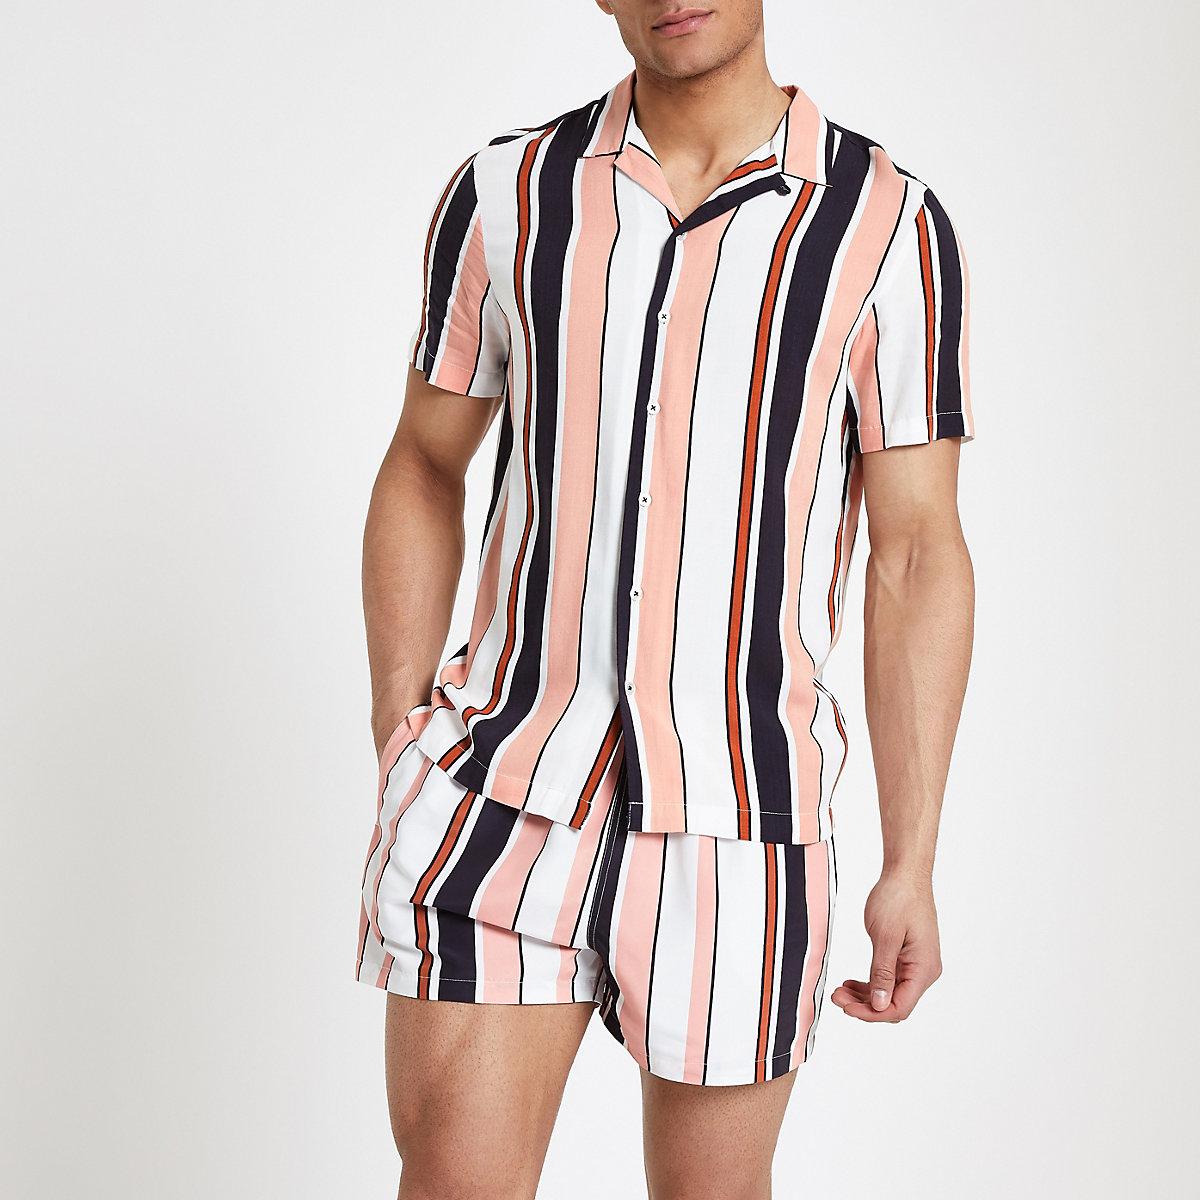 Coral stripe short sleeve revere shirt